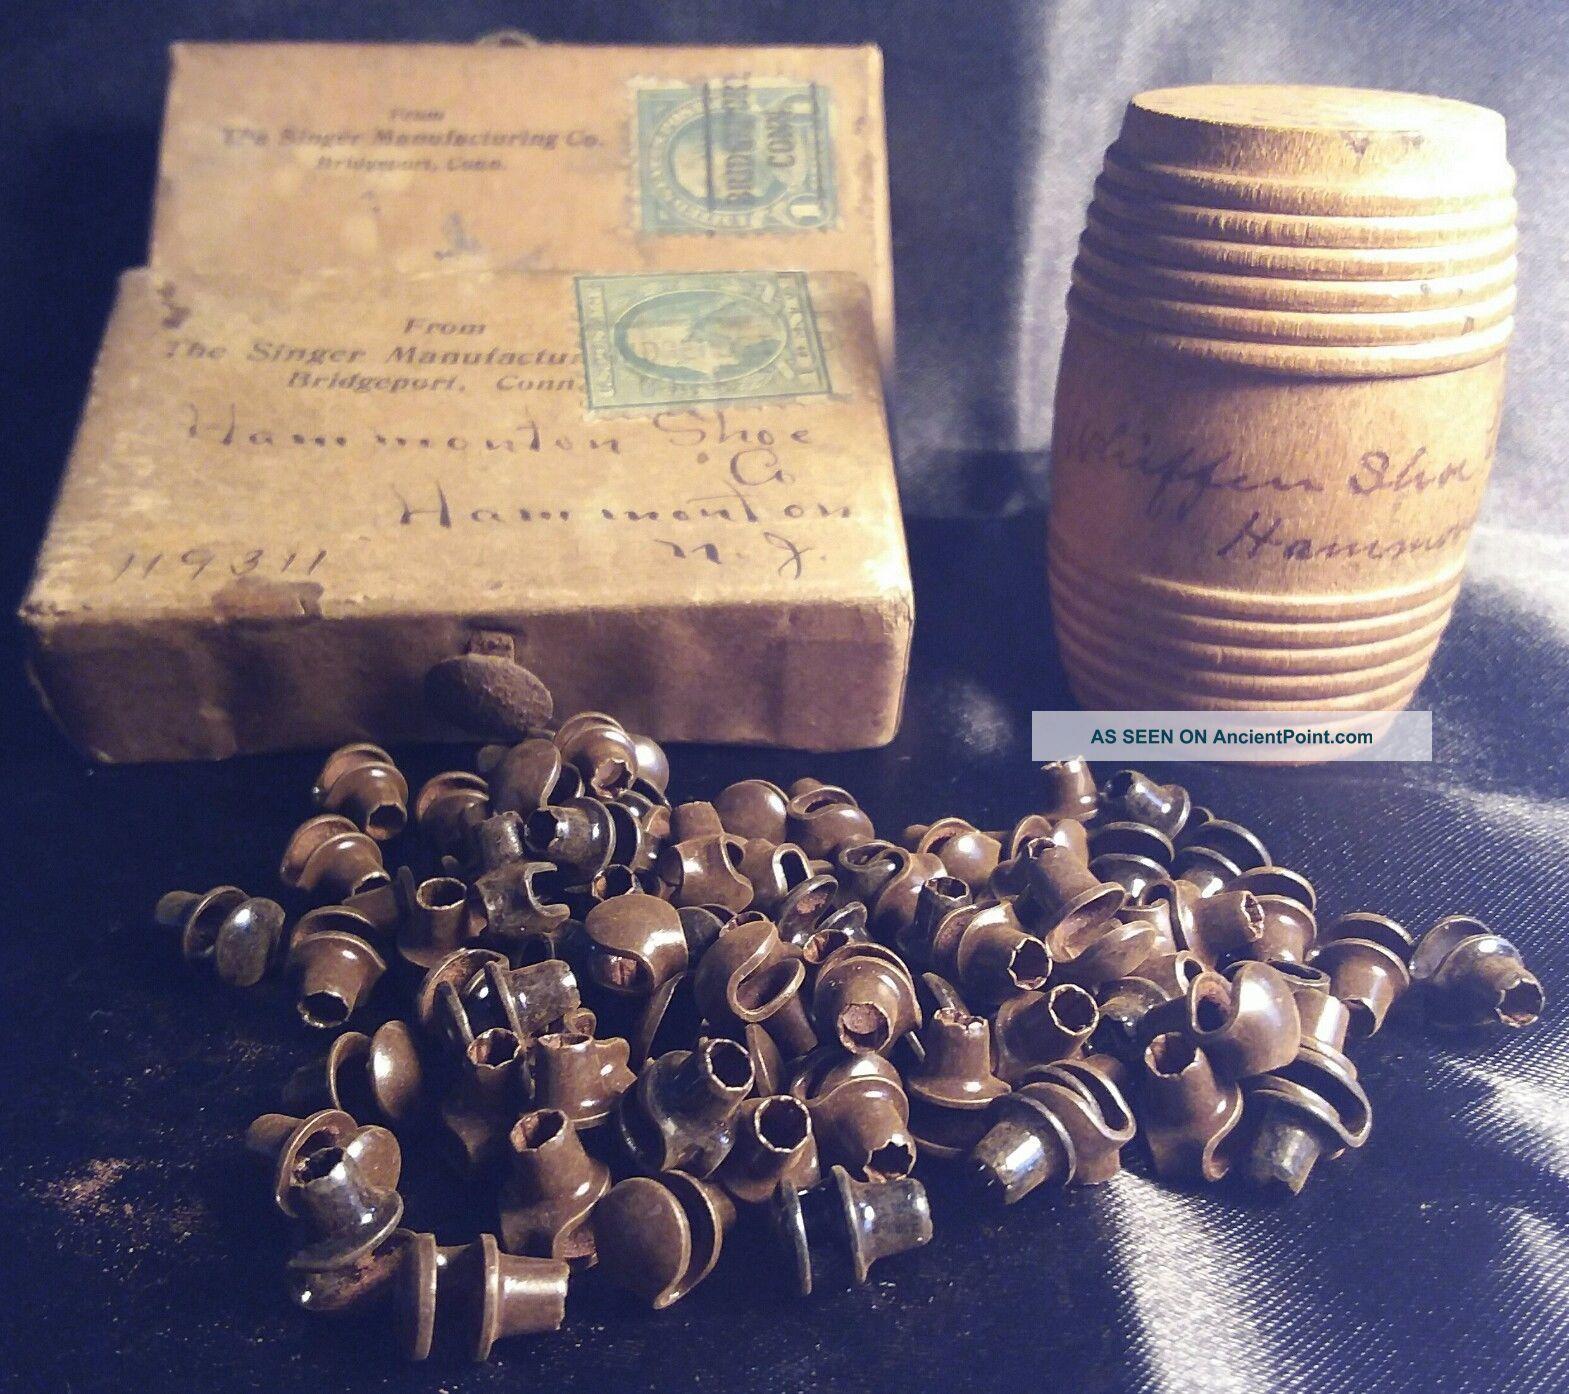 Rare Antique Hammonton Nj Shoe Co Sample Wood Barrel Boxes Singer Mfg Hooks Mail Other Mercantile Antiques photo